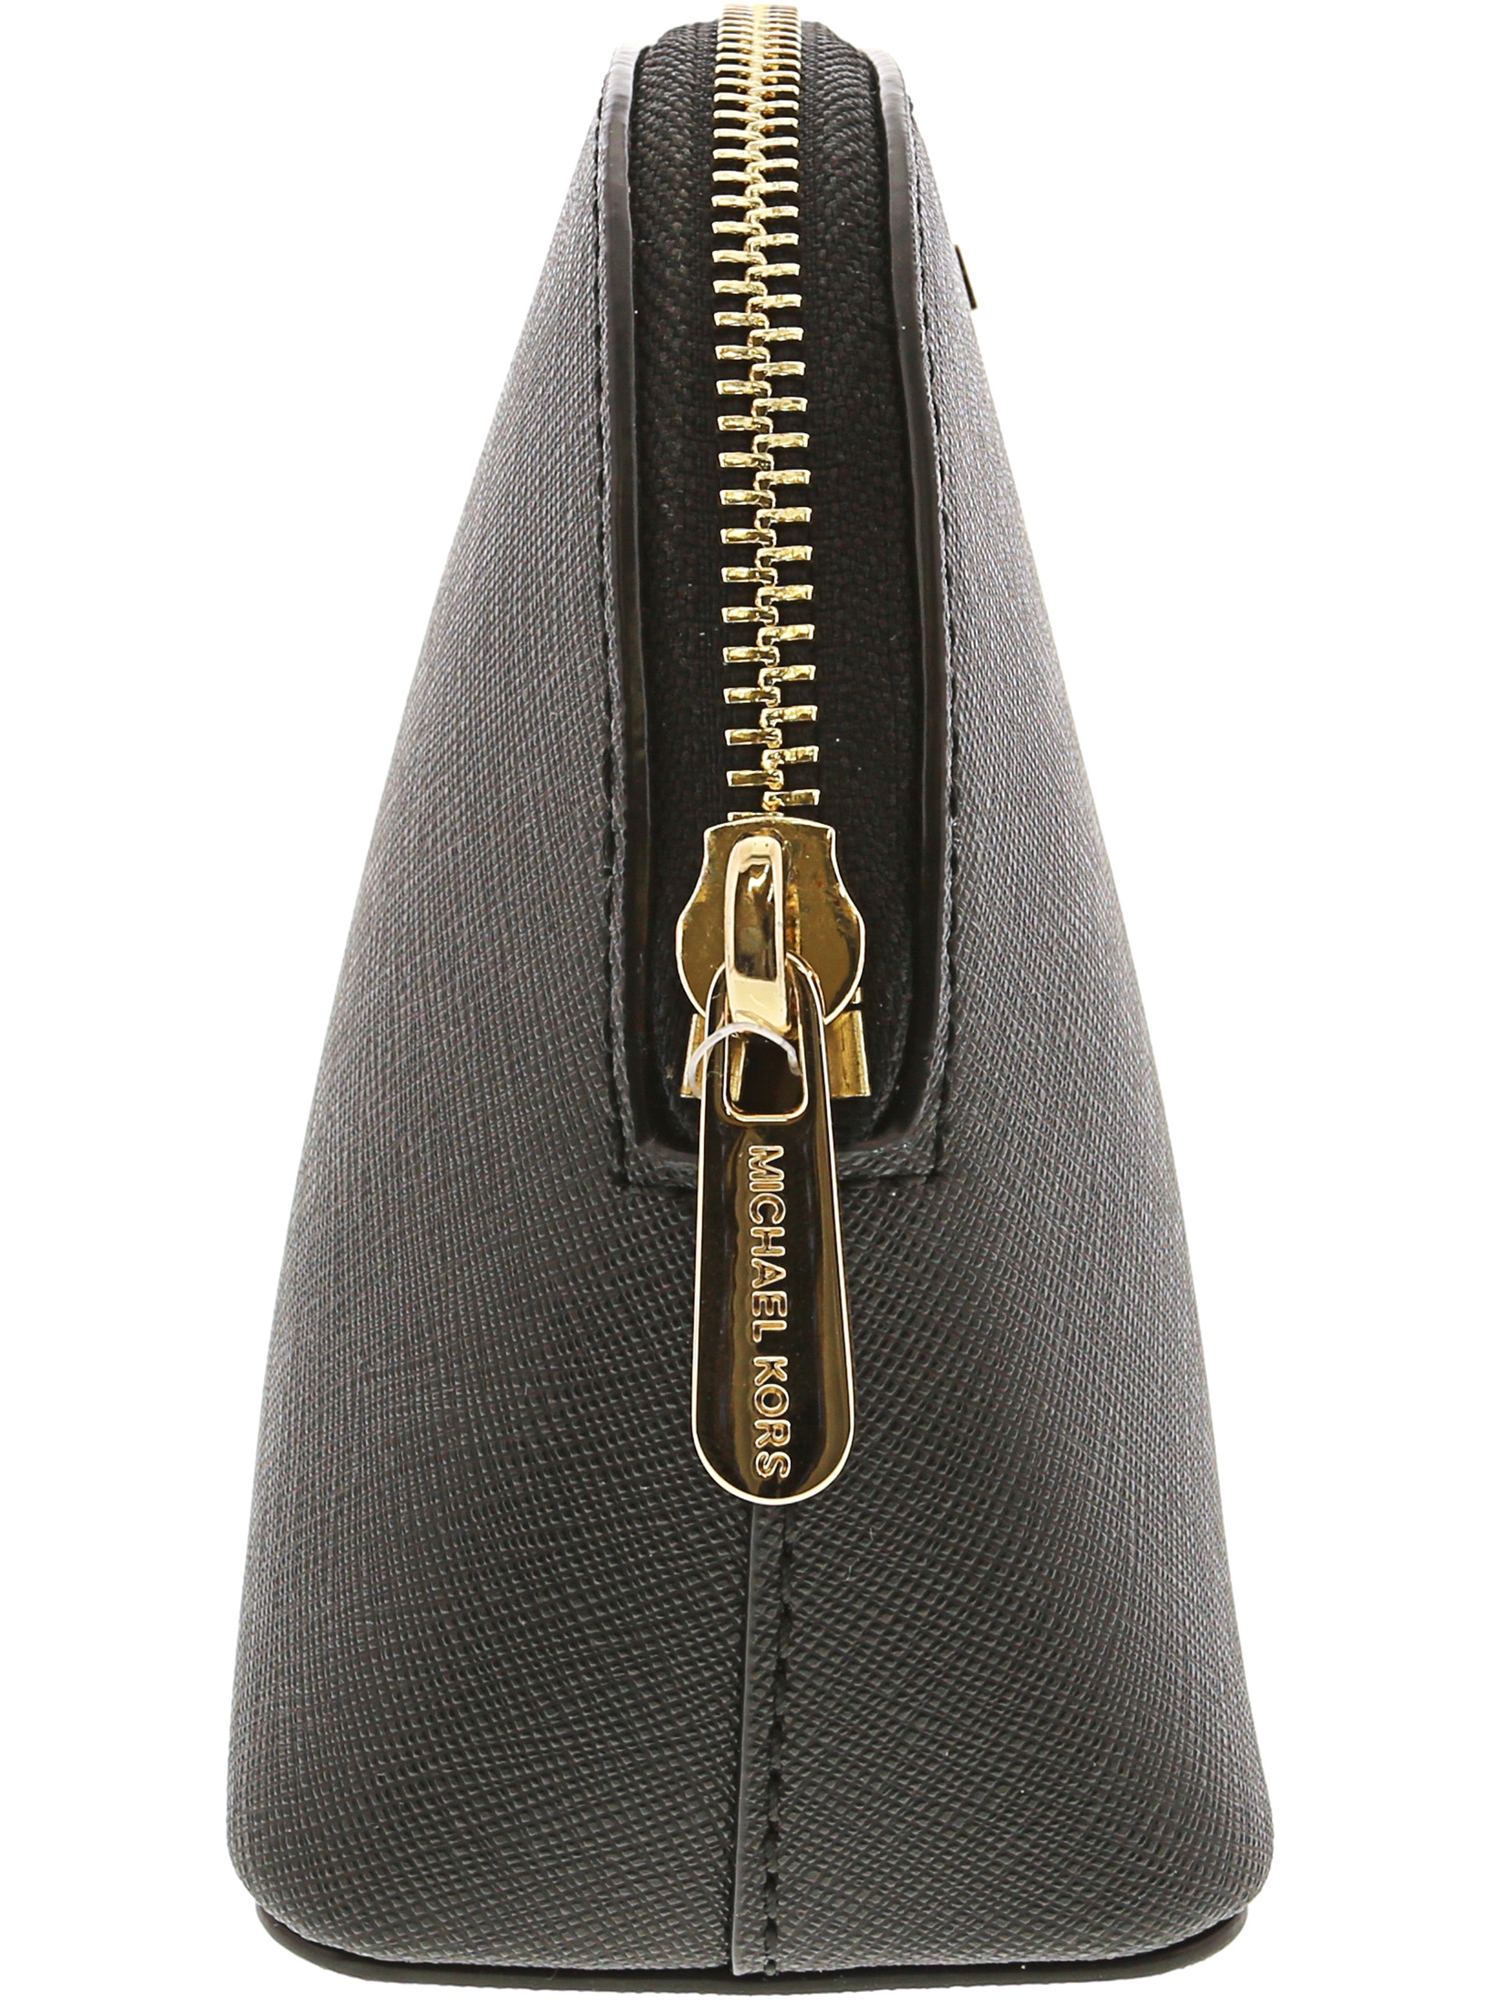 4c373e461c1b Michael Kors Women s Jet Set Travel Large Leather Pouch Cosmetic Bag -  Merlot - Walmart.com